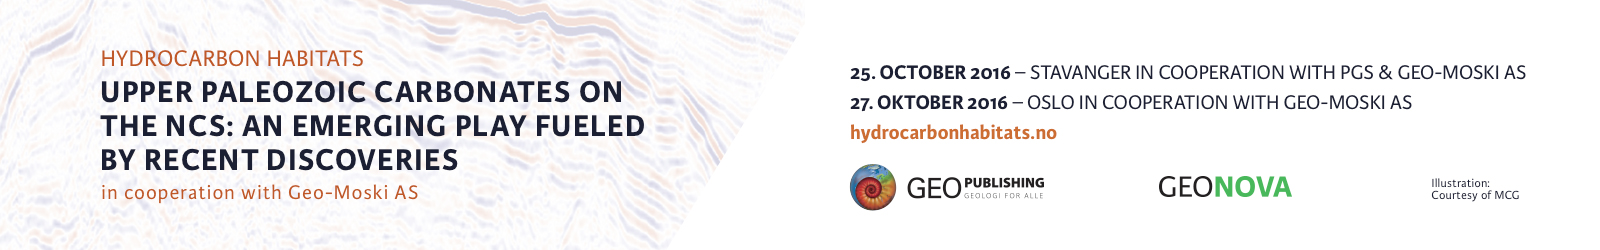 hydrocarbon-habitats_banner